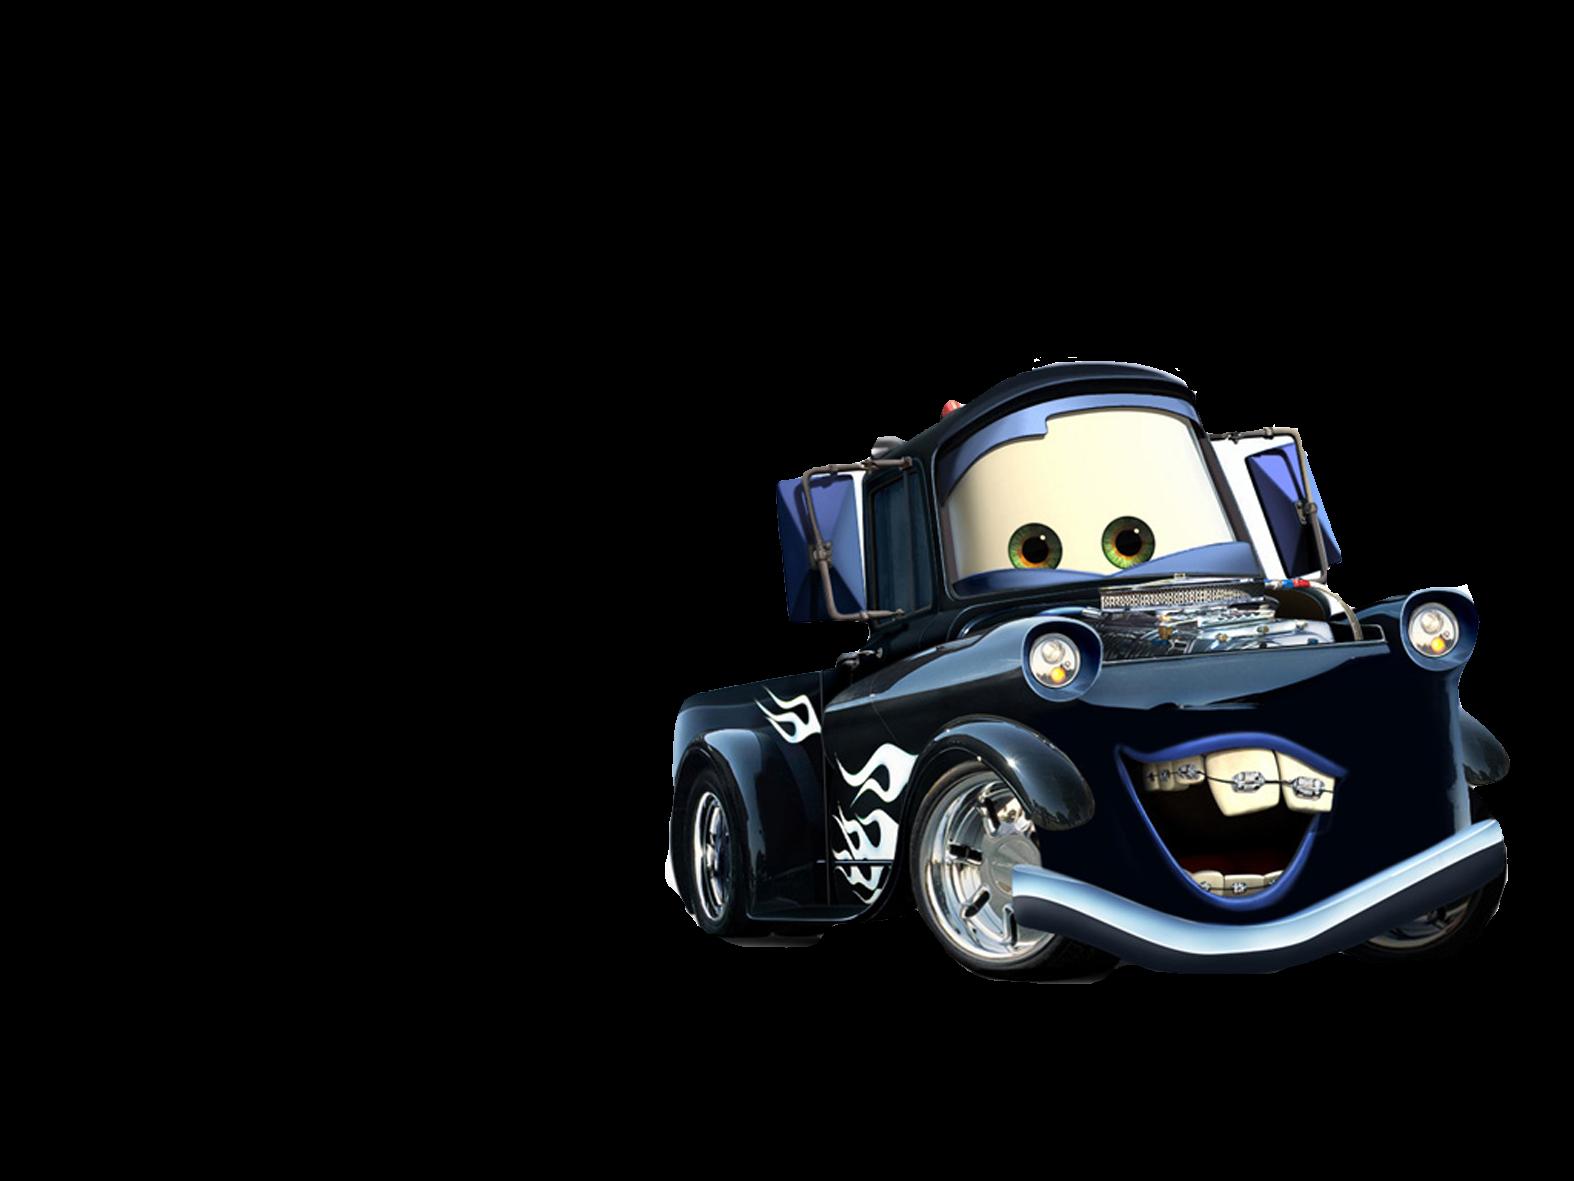 Central Photoshop Imagens Png Filme Cars#2